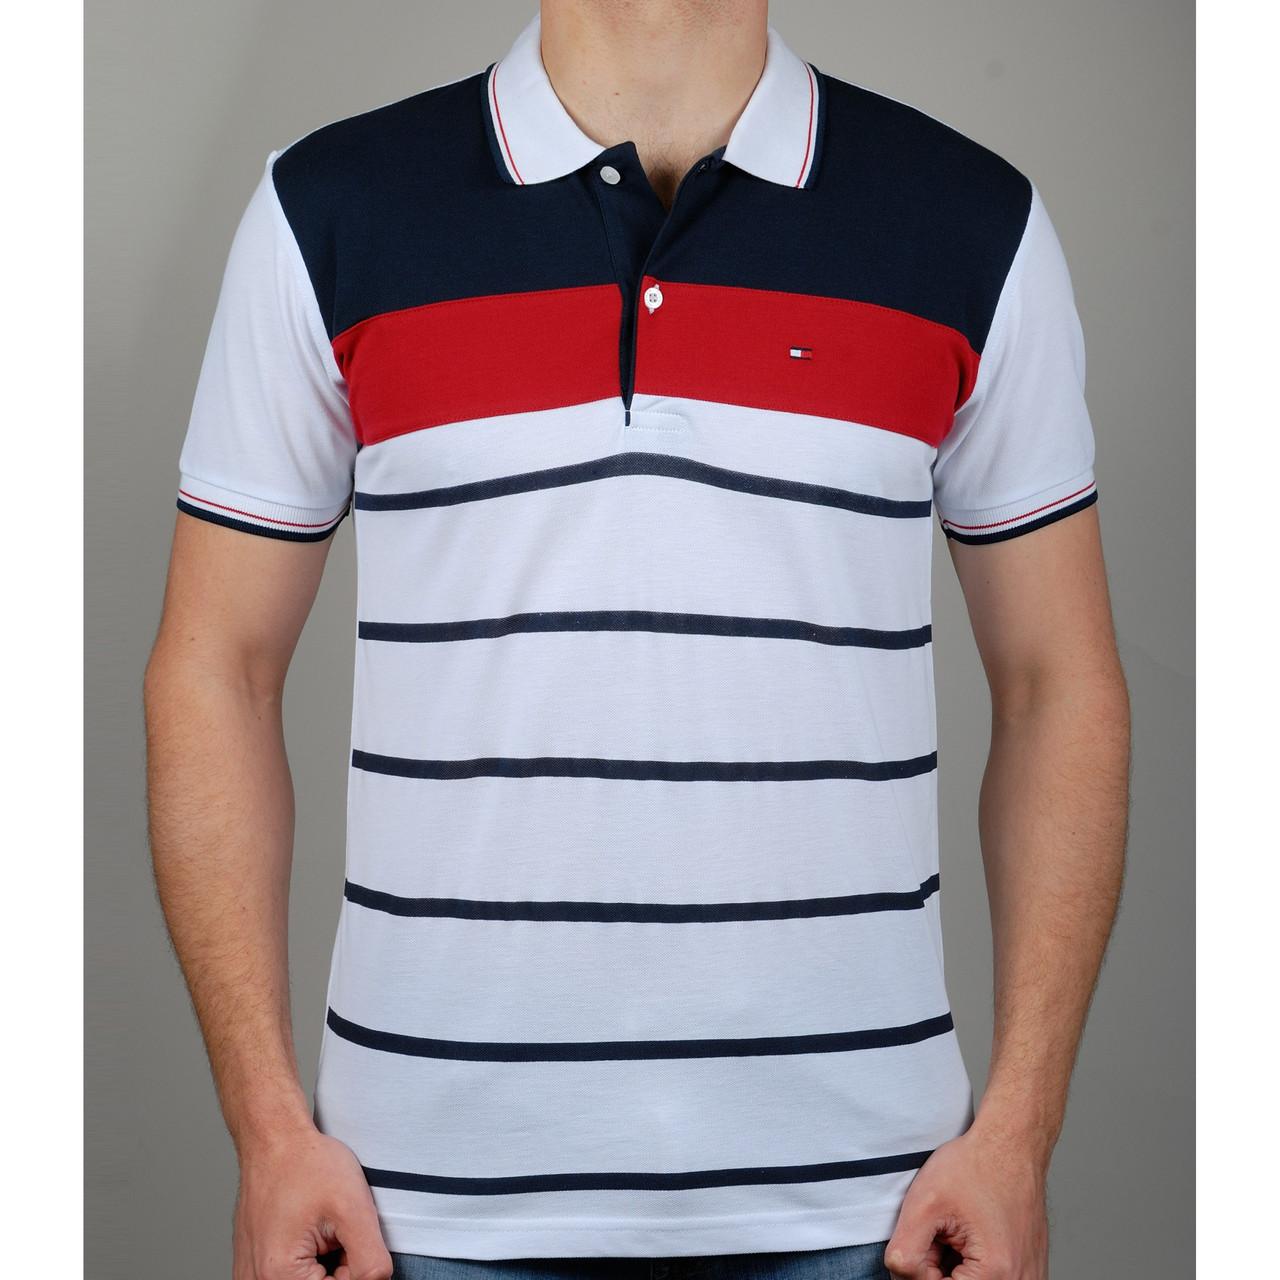 Мужская футболка поло TOMMY HILFIGER R375 белая